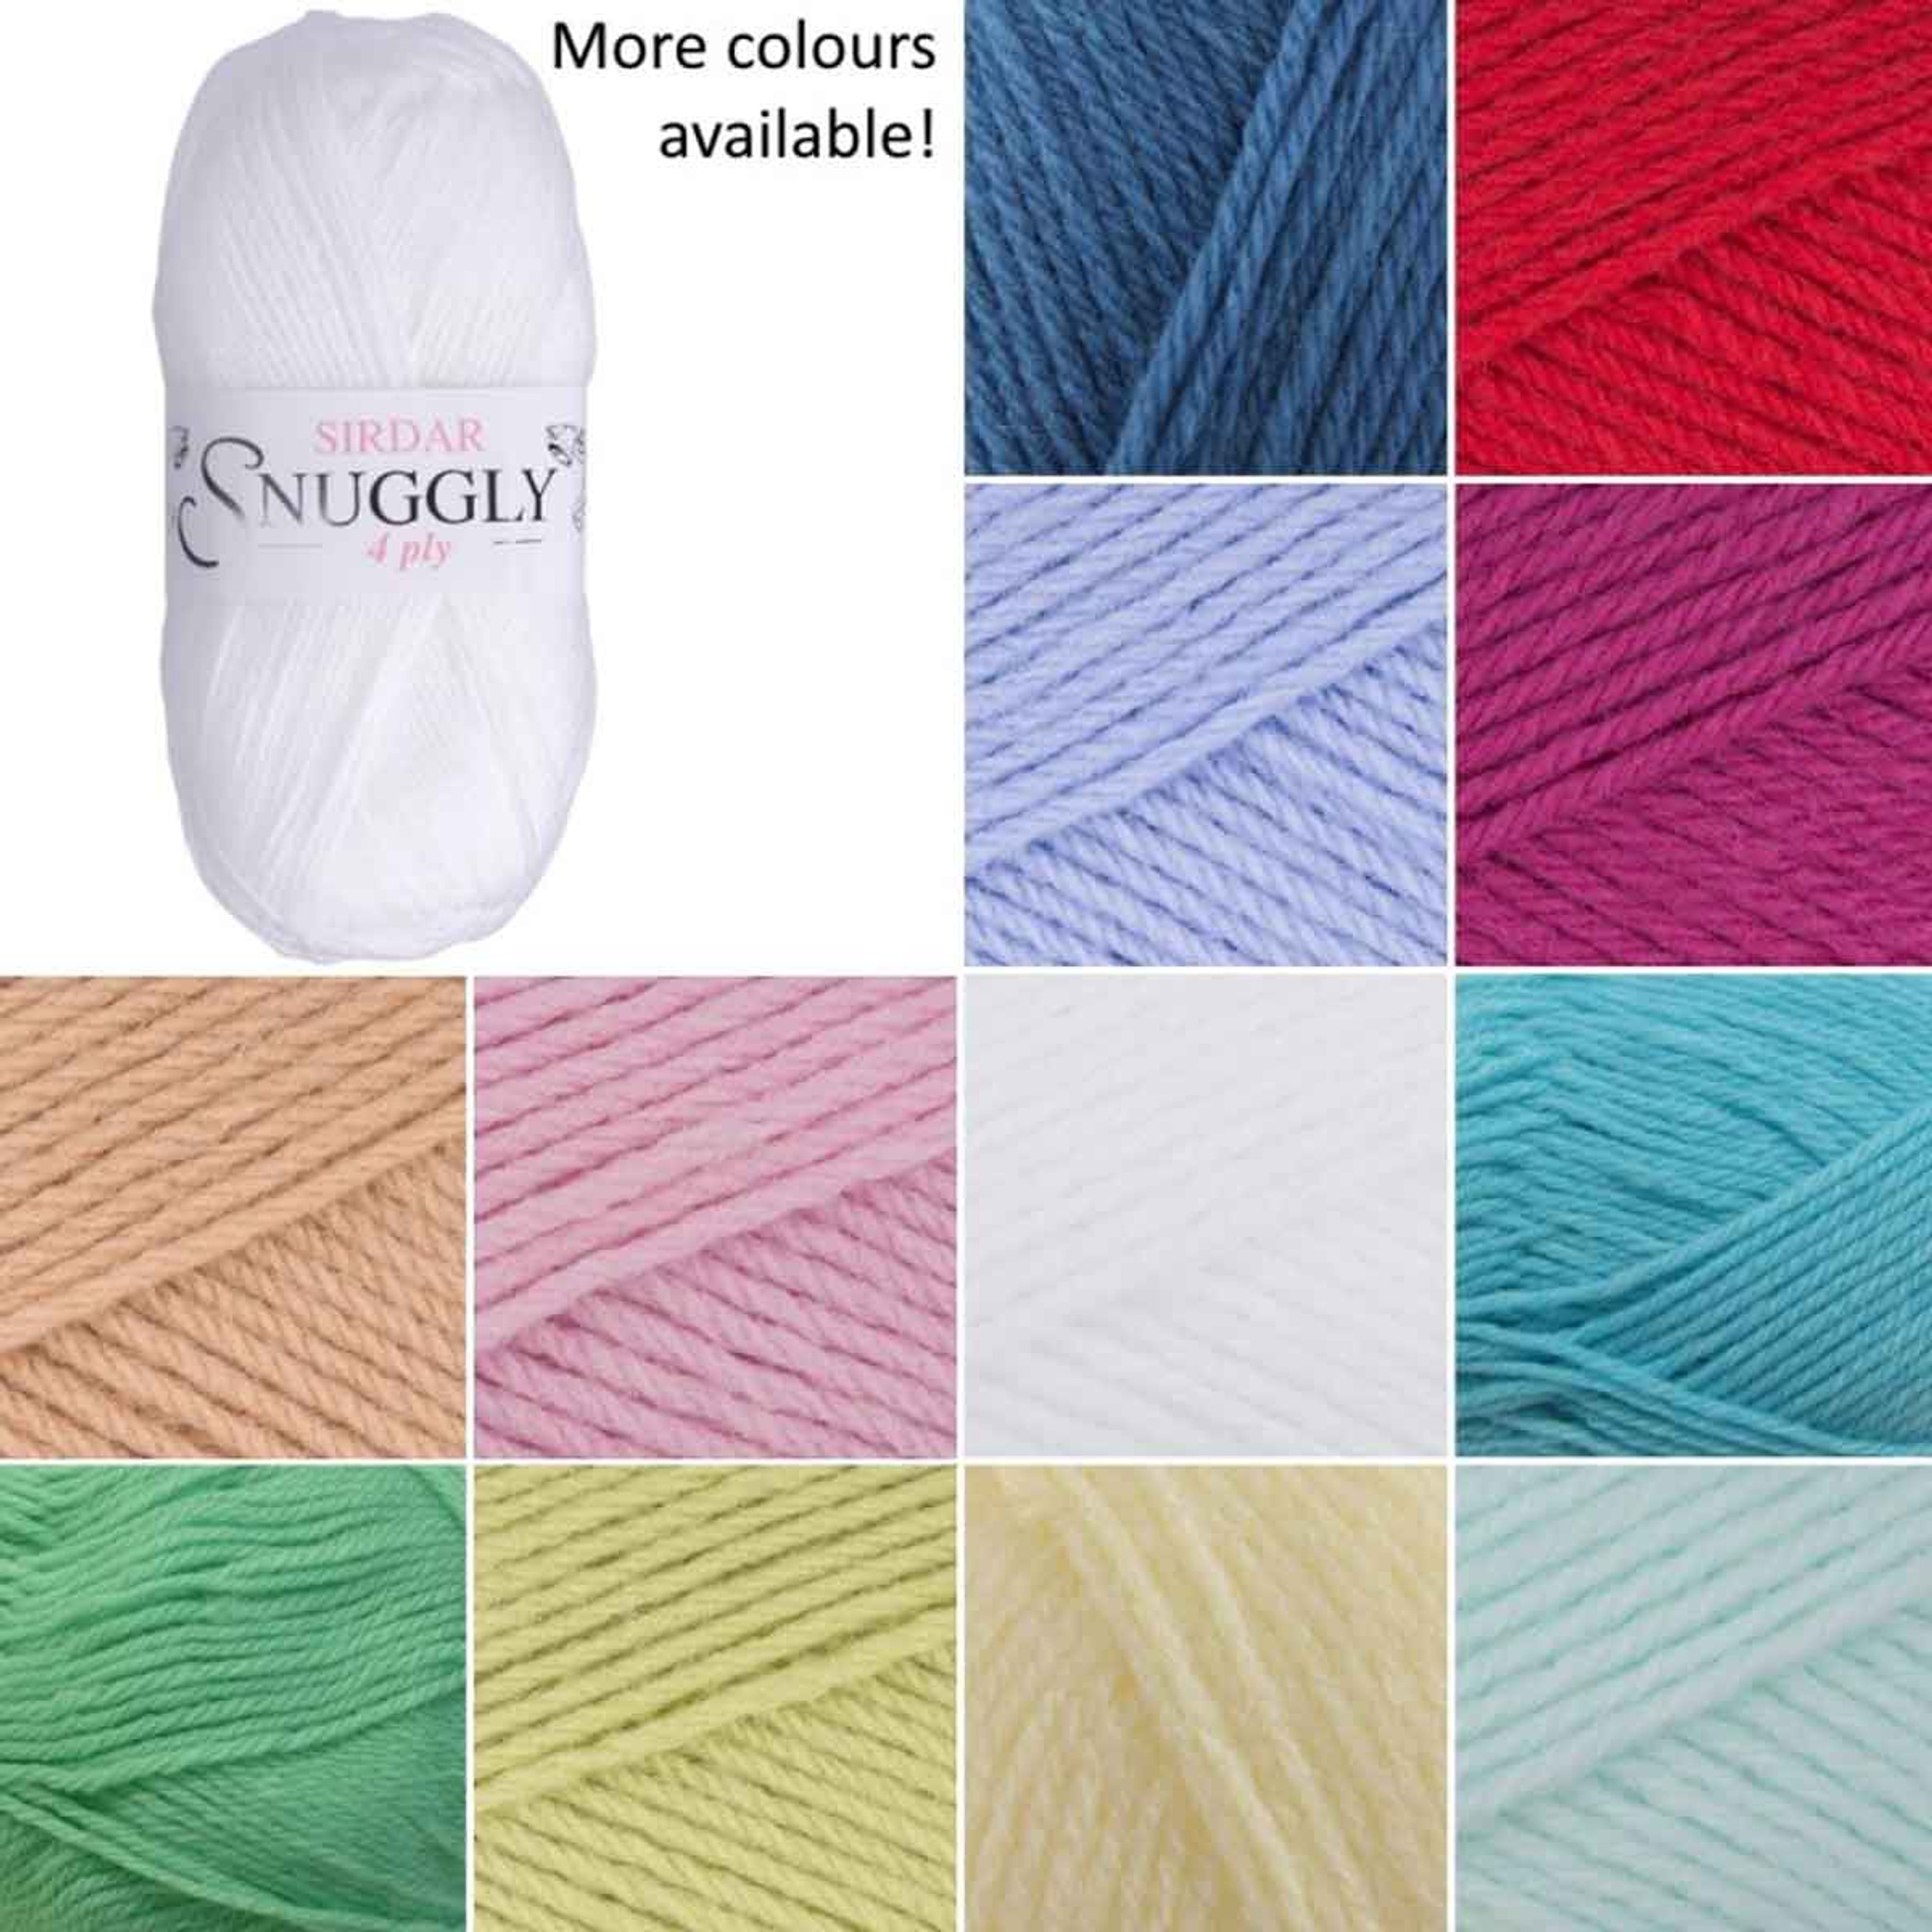 428 Soft Brown Sirdar SNUGGLY DOUBLE KNITTING BABY Knitting Wool//Yarn 50g